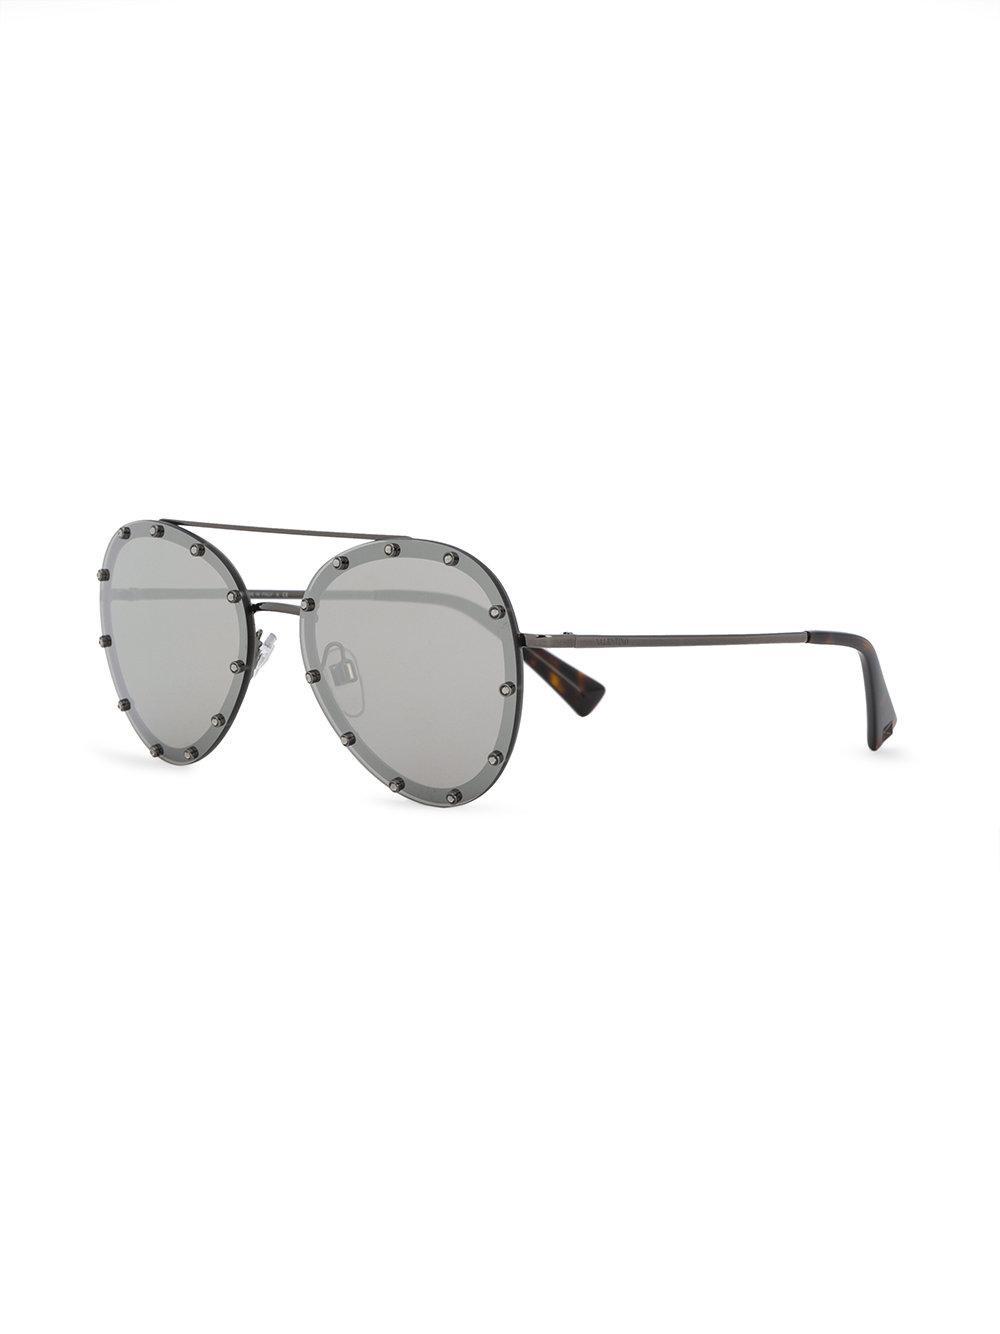 Valentino Garavani Rockstud Embrace sunglasses - Metallic Valentino kyvEJGQJv